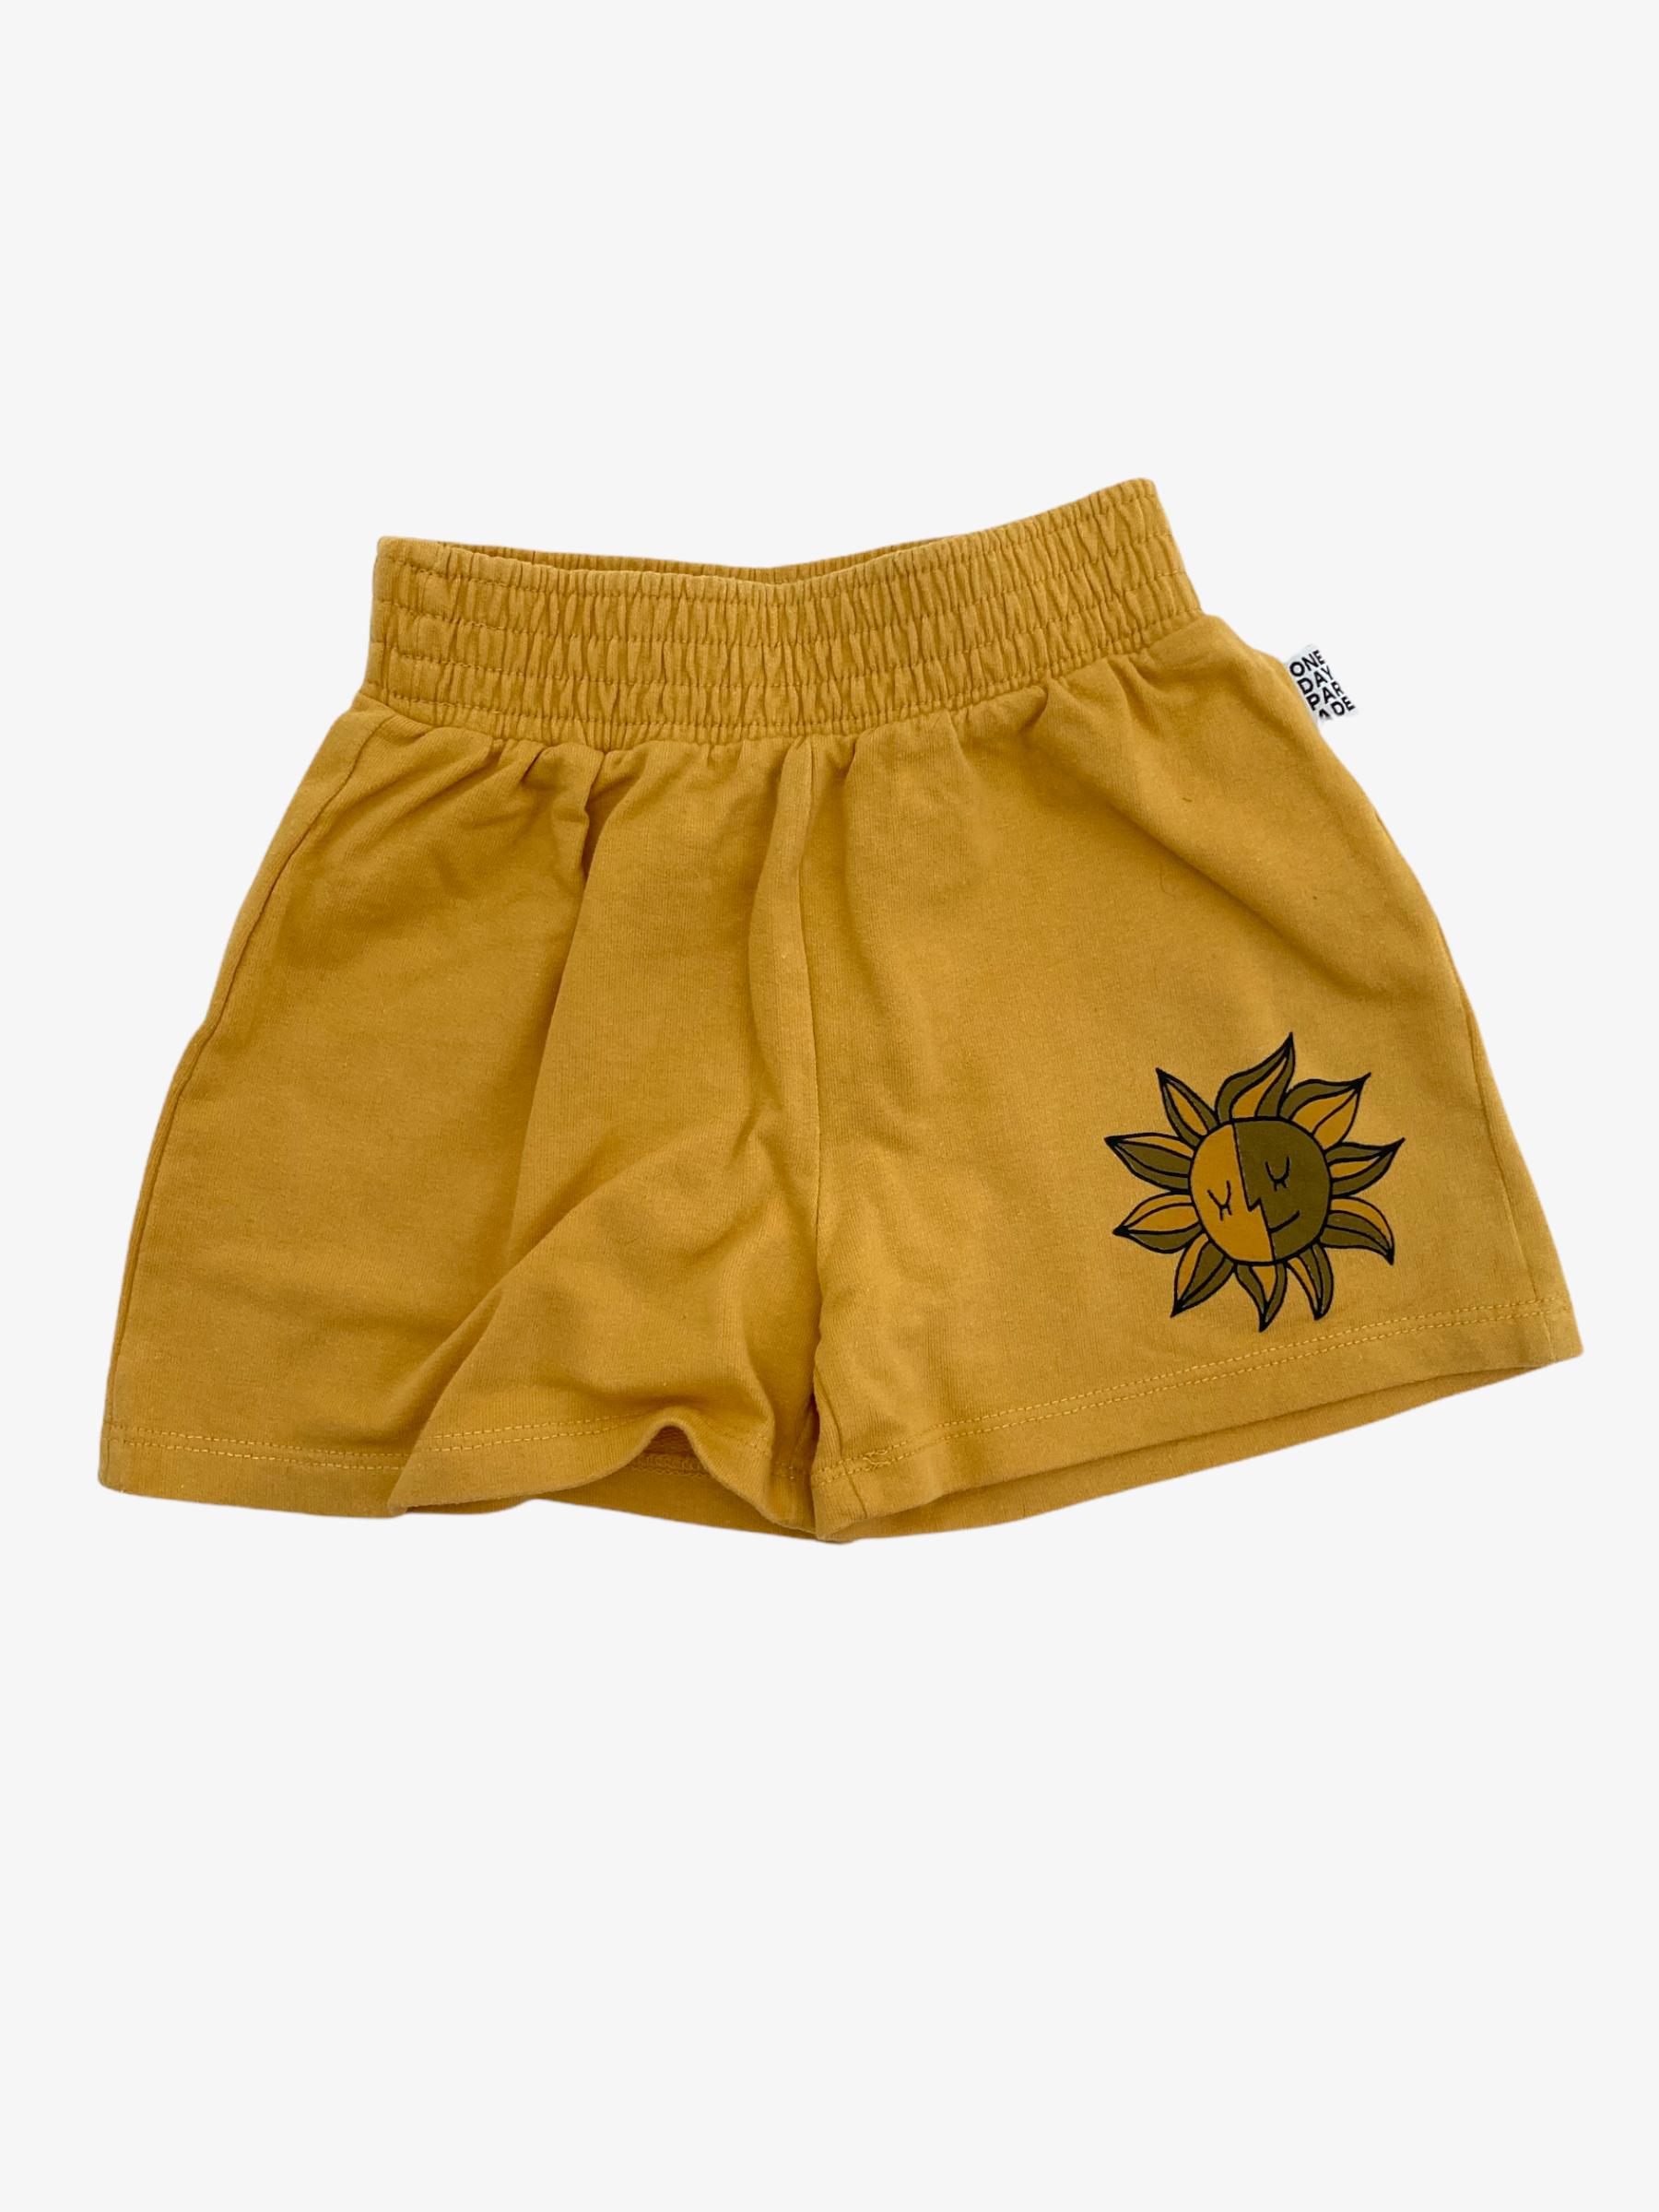 Korte broek • Tweedehands korte broek van merk One Day Parade in maat 74